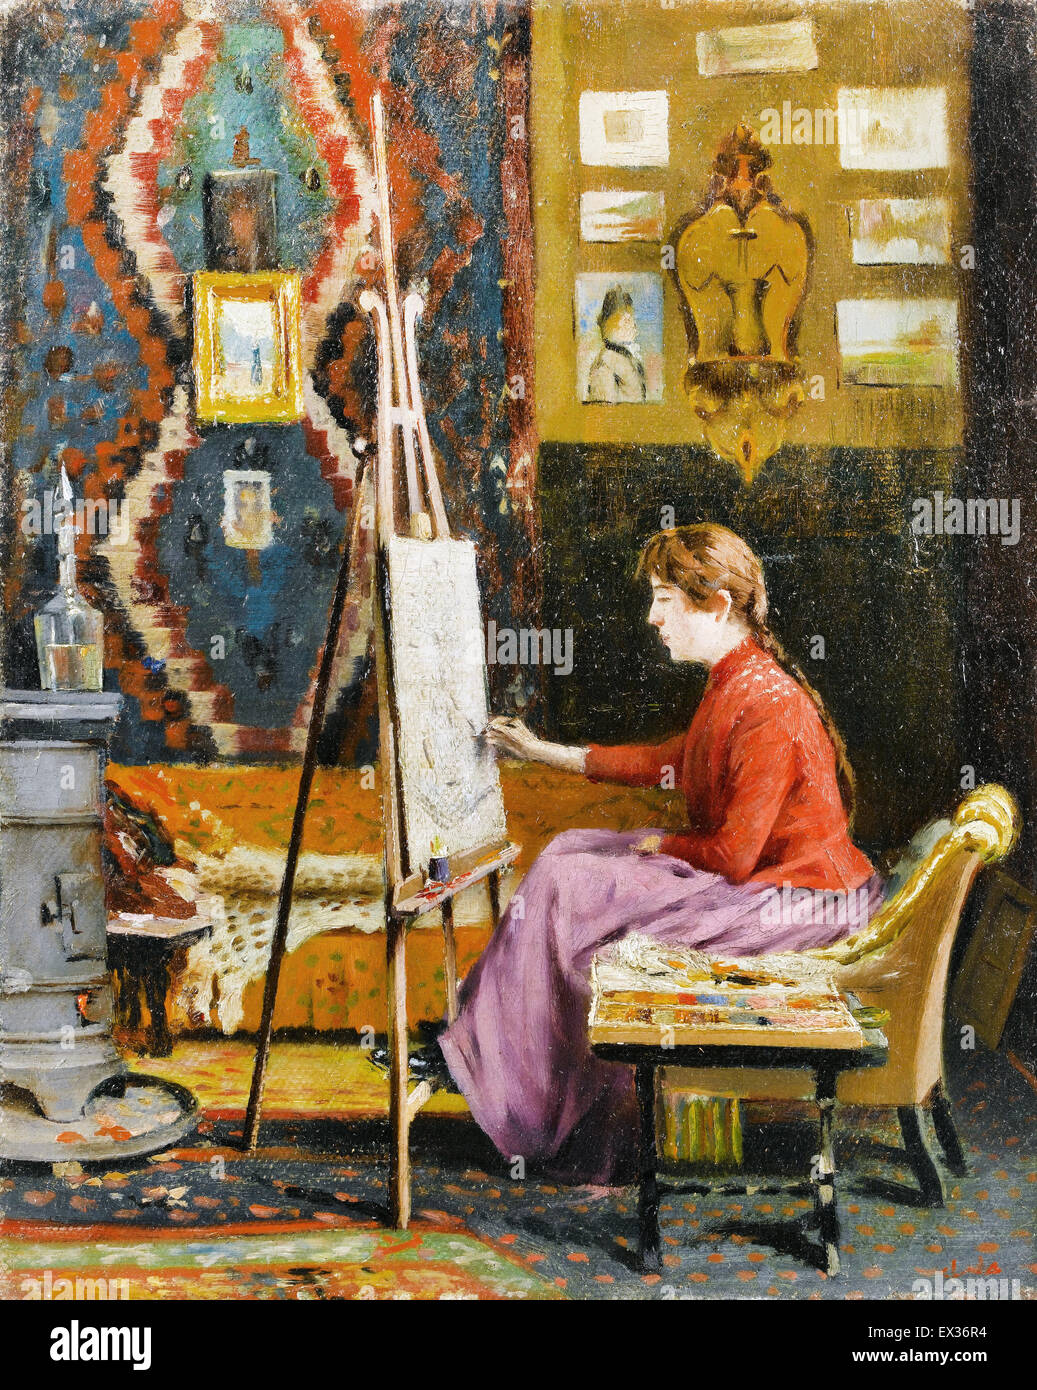 Halil Pasa, Girl Painter and Her Studio 1939 Oil on canvas. Sakip Sabanci Museum, Istanbul, Turkey. - Stock Image